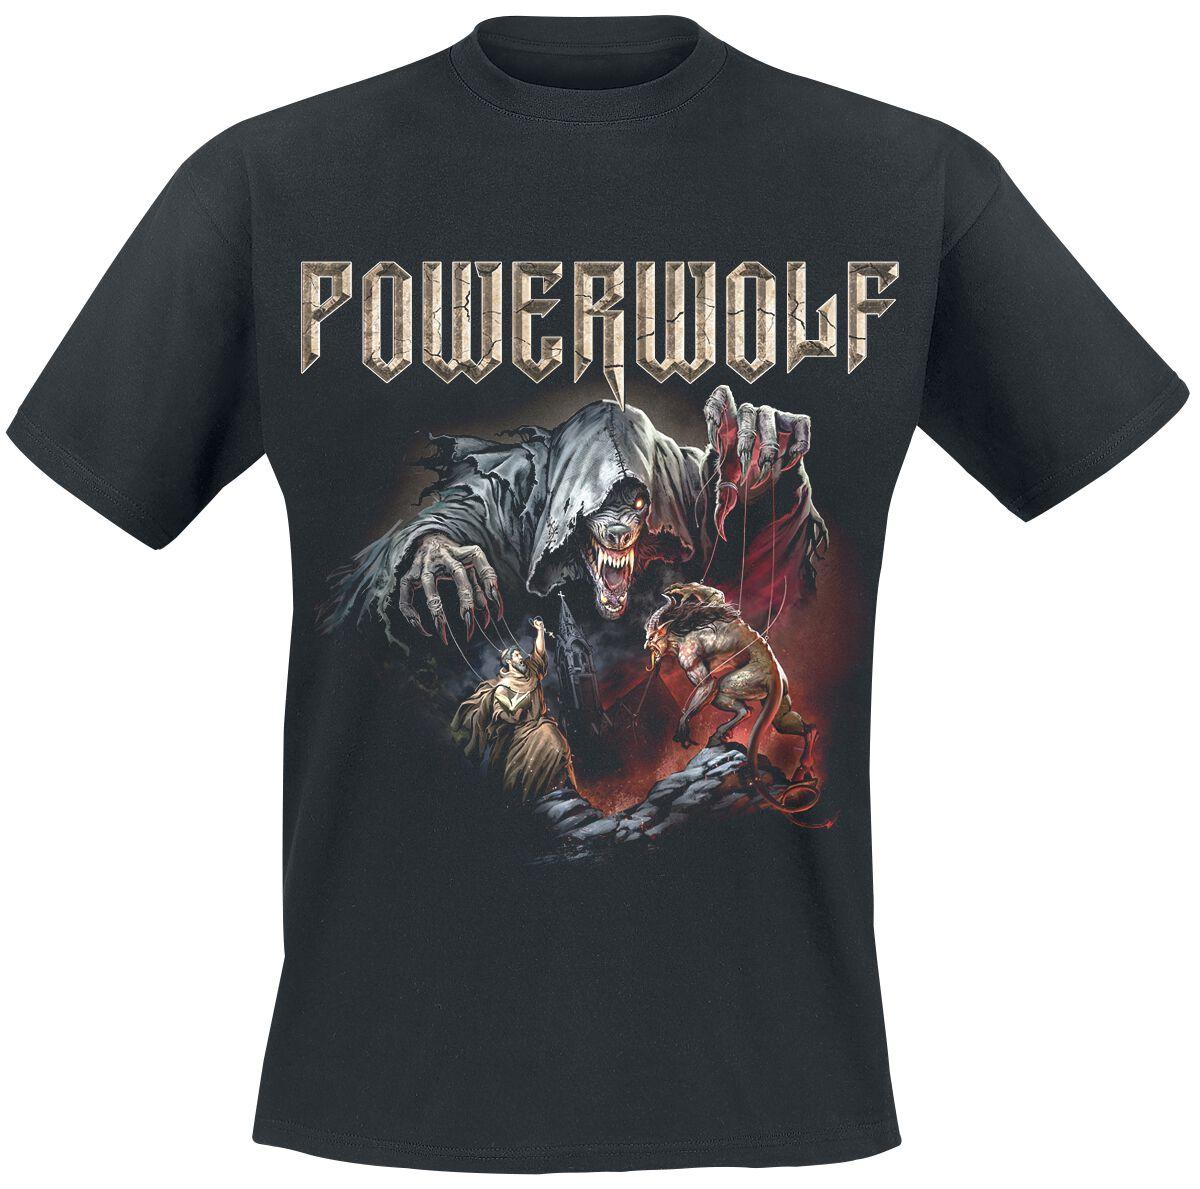 Image of   Powerwolf The Sacrament Of Sin T-Shirt sort